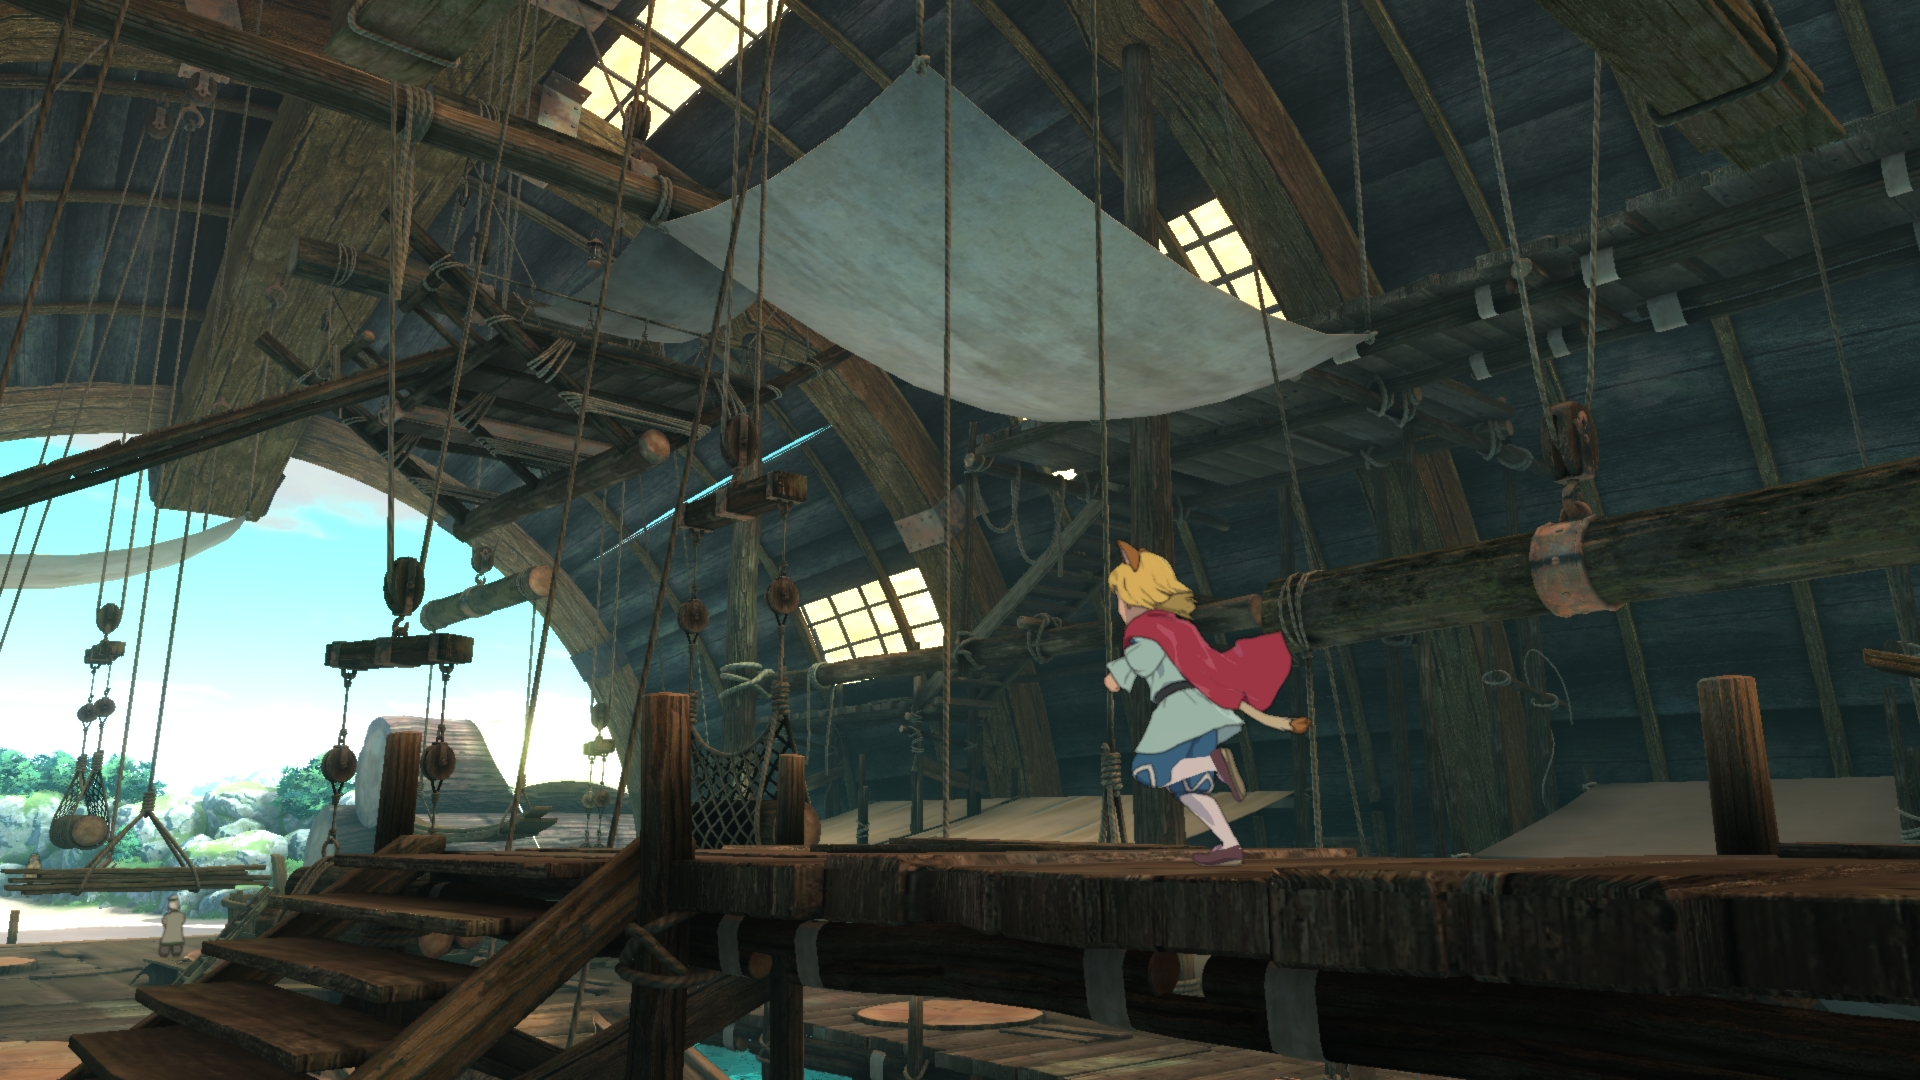 Ni no Kuni II: Revenant Kingdom v traileru a na screenshotech pro letošní Gamescom 148572